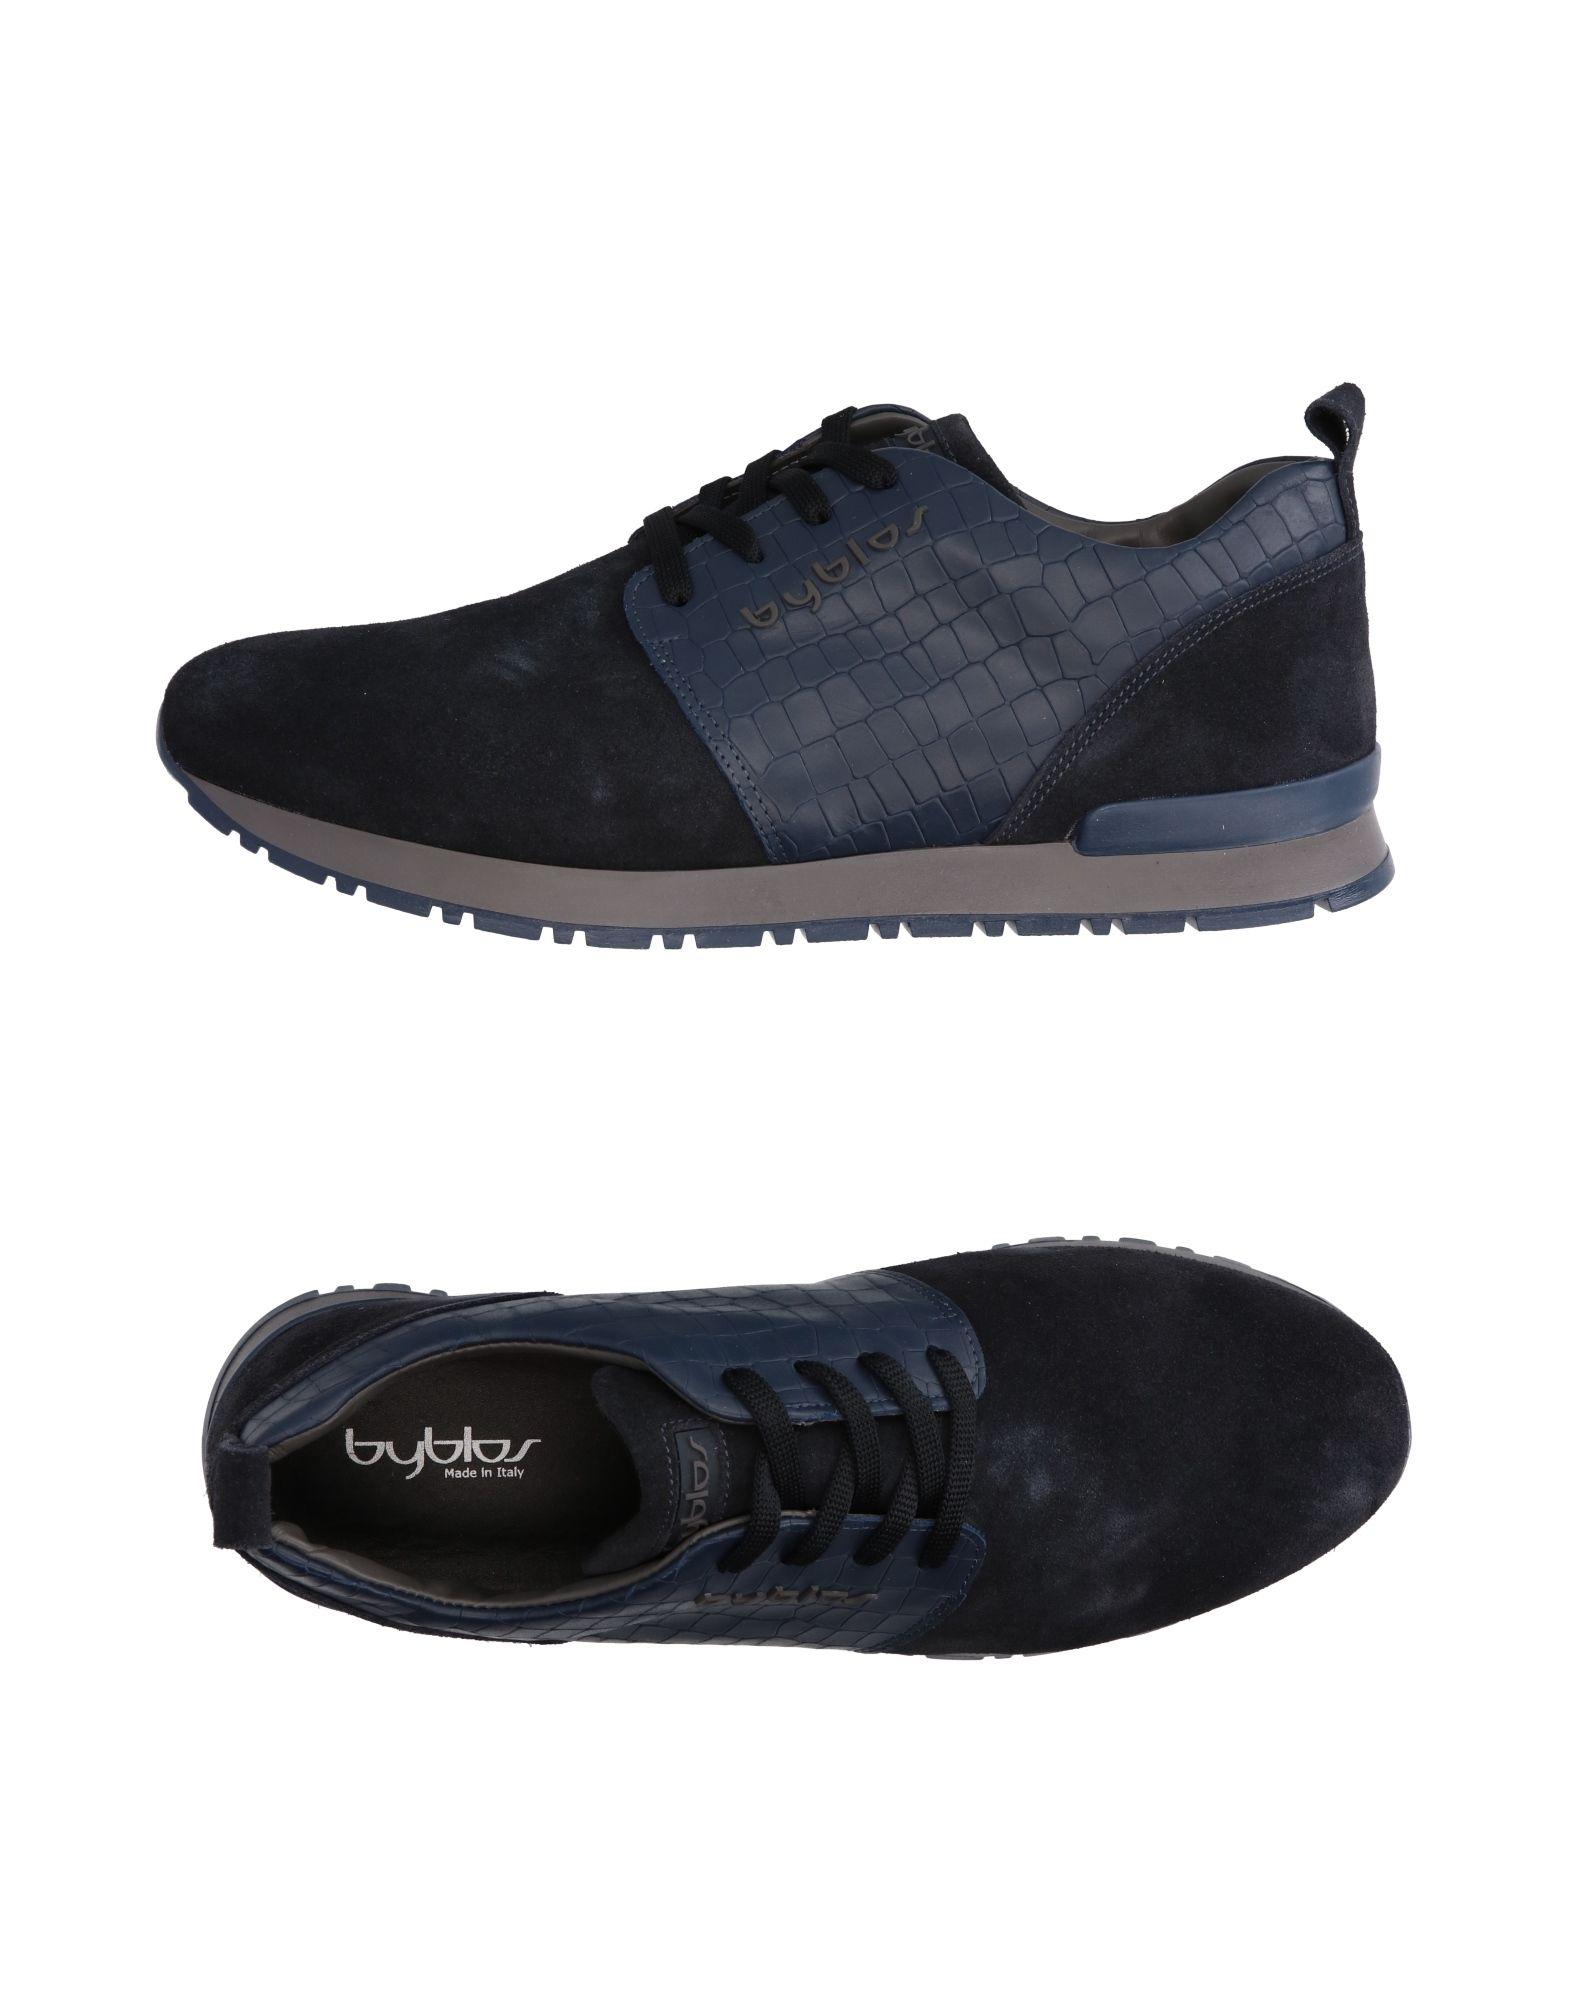 Byblos Sneakers online - Men Byblos Sneakers online Sneakers on  Australia - 11238605RC 9a23ea